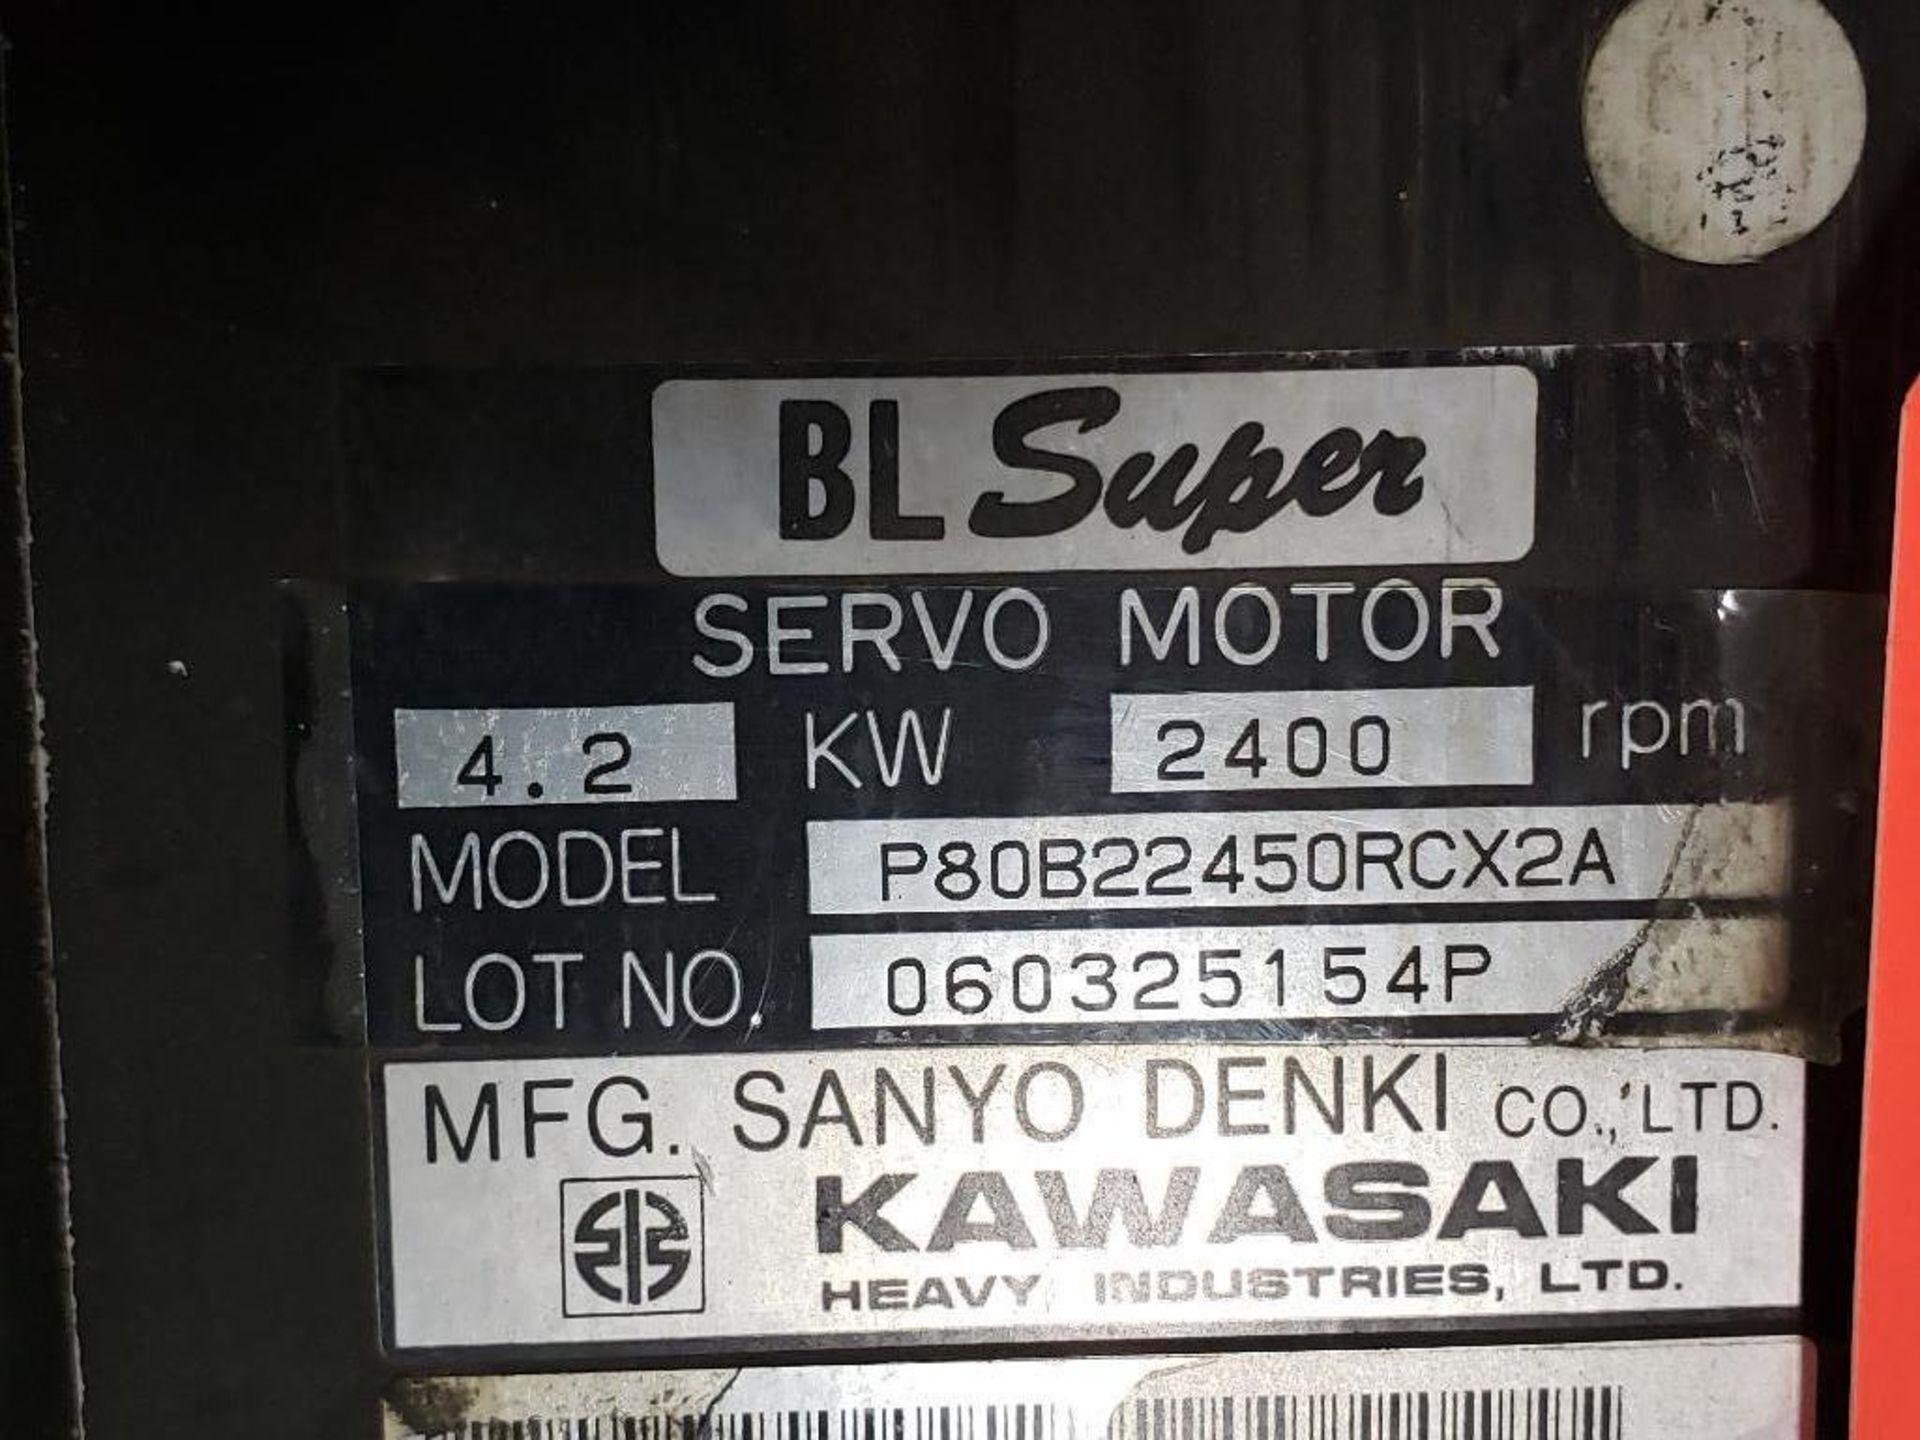 4.2kW Kawasaki Servo Motor P80B22450RCX2A. 2400RPM. - Image 2 of 3